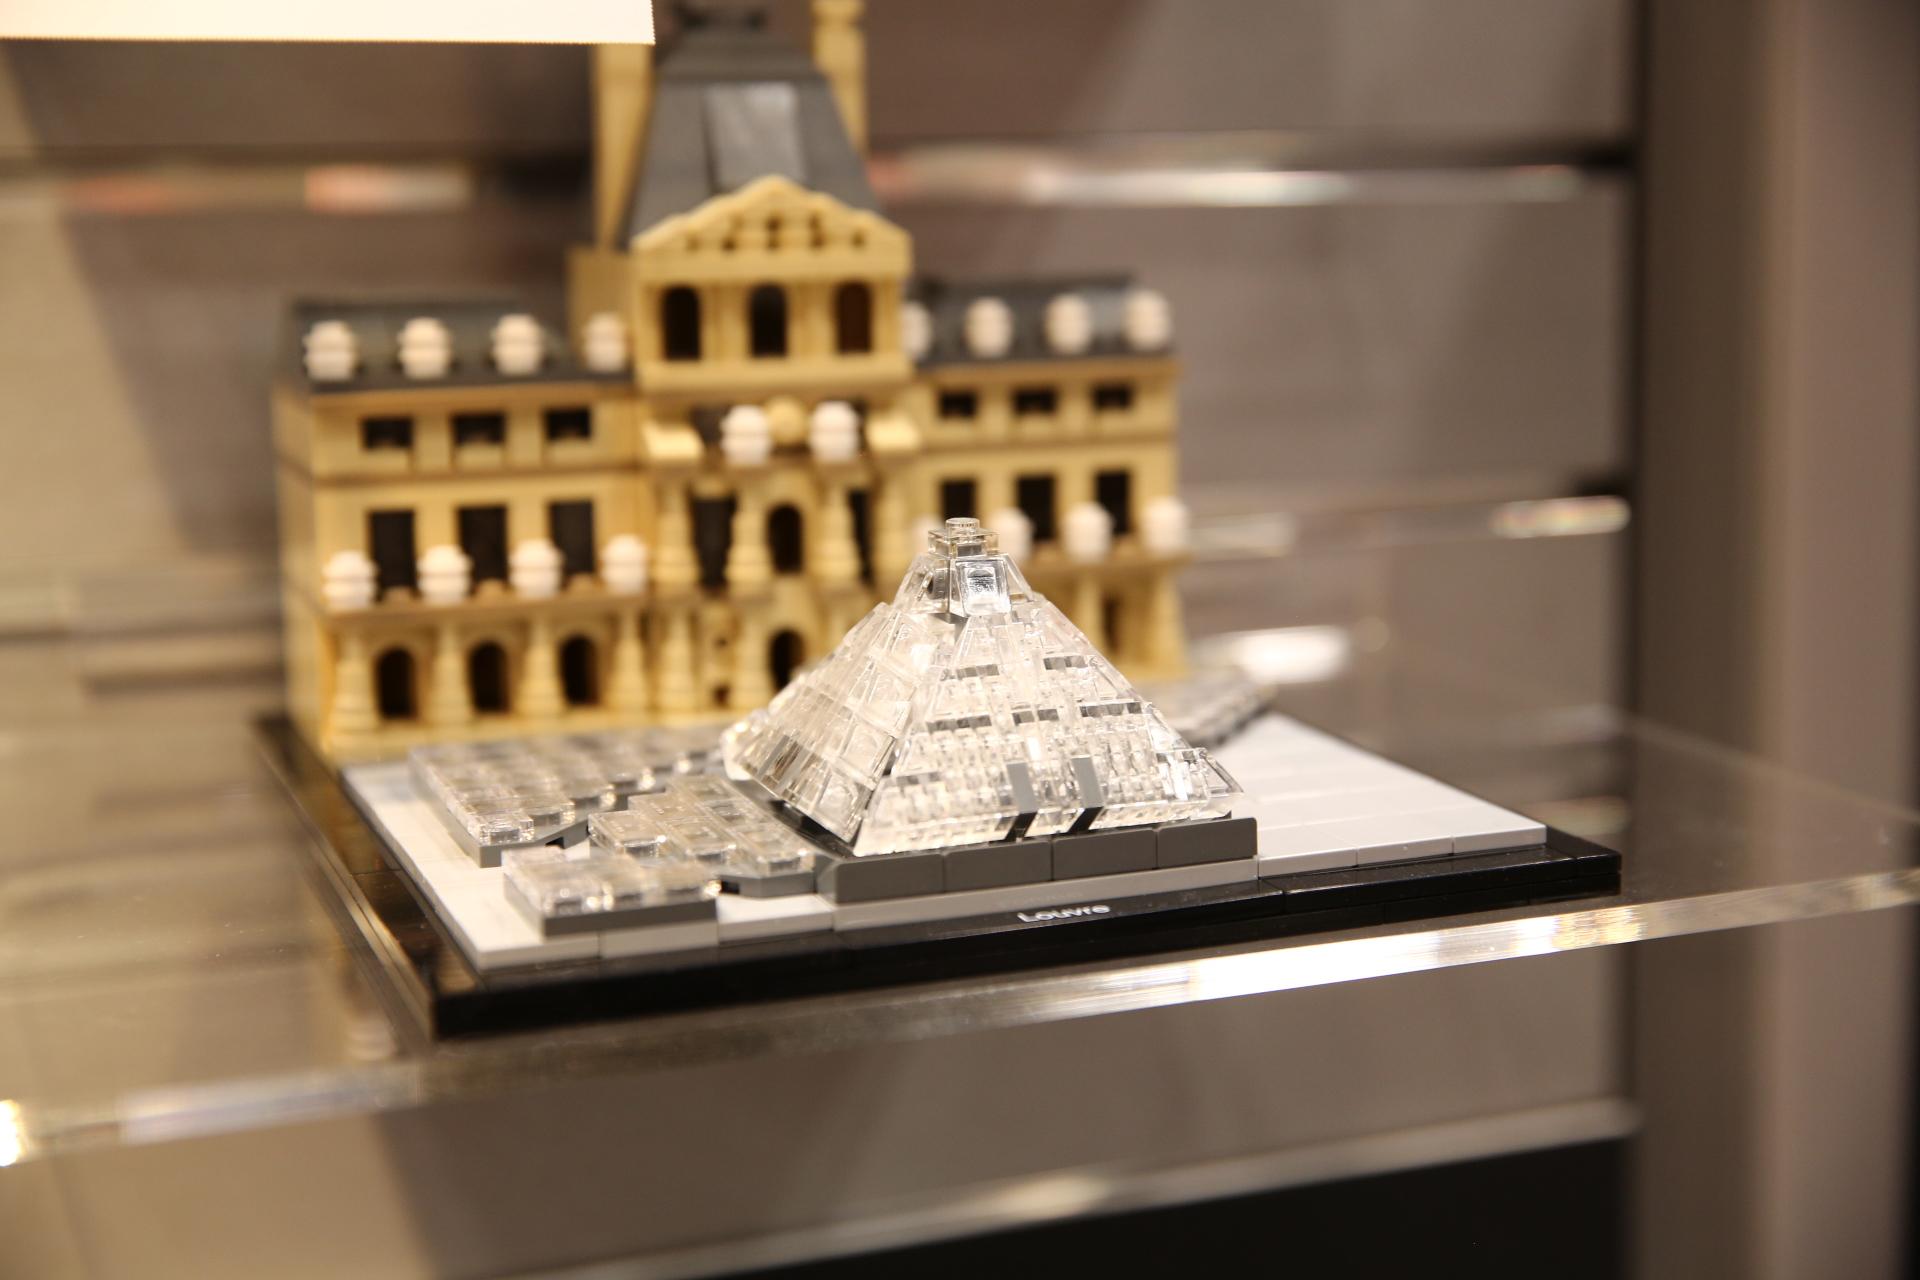 Lego Architecture 2015 | Toy Fair Report 2015 Lego Architecture 21024 The Louvre Fbtb